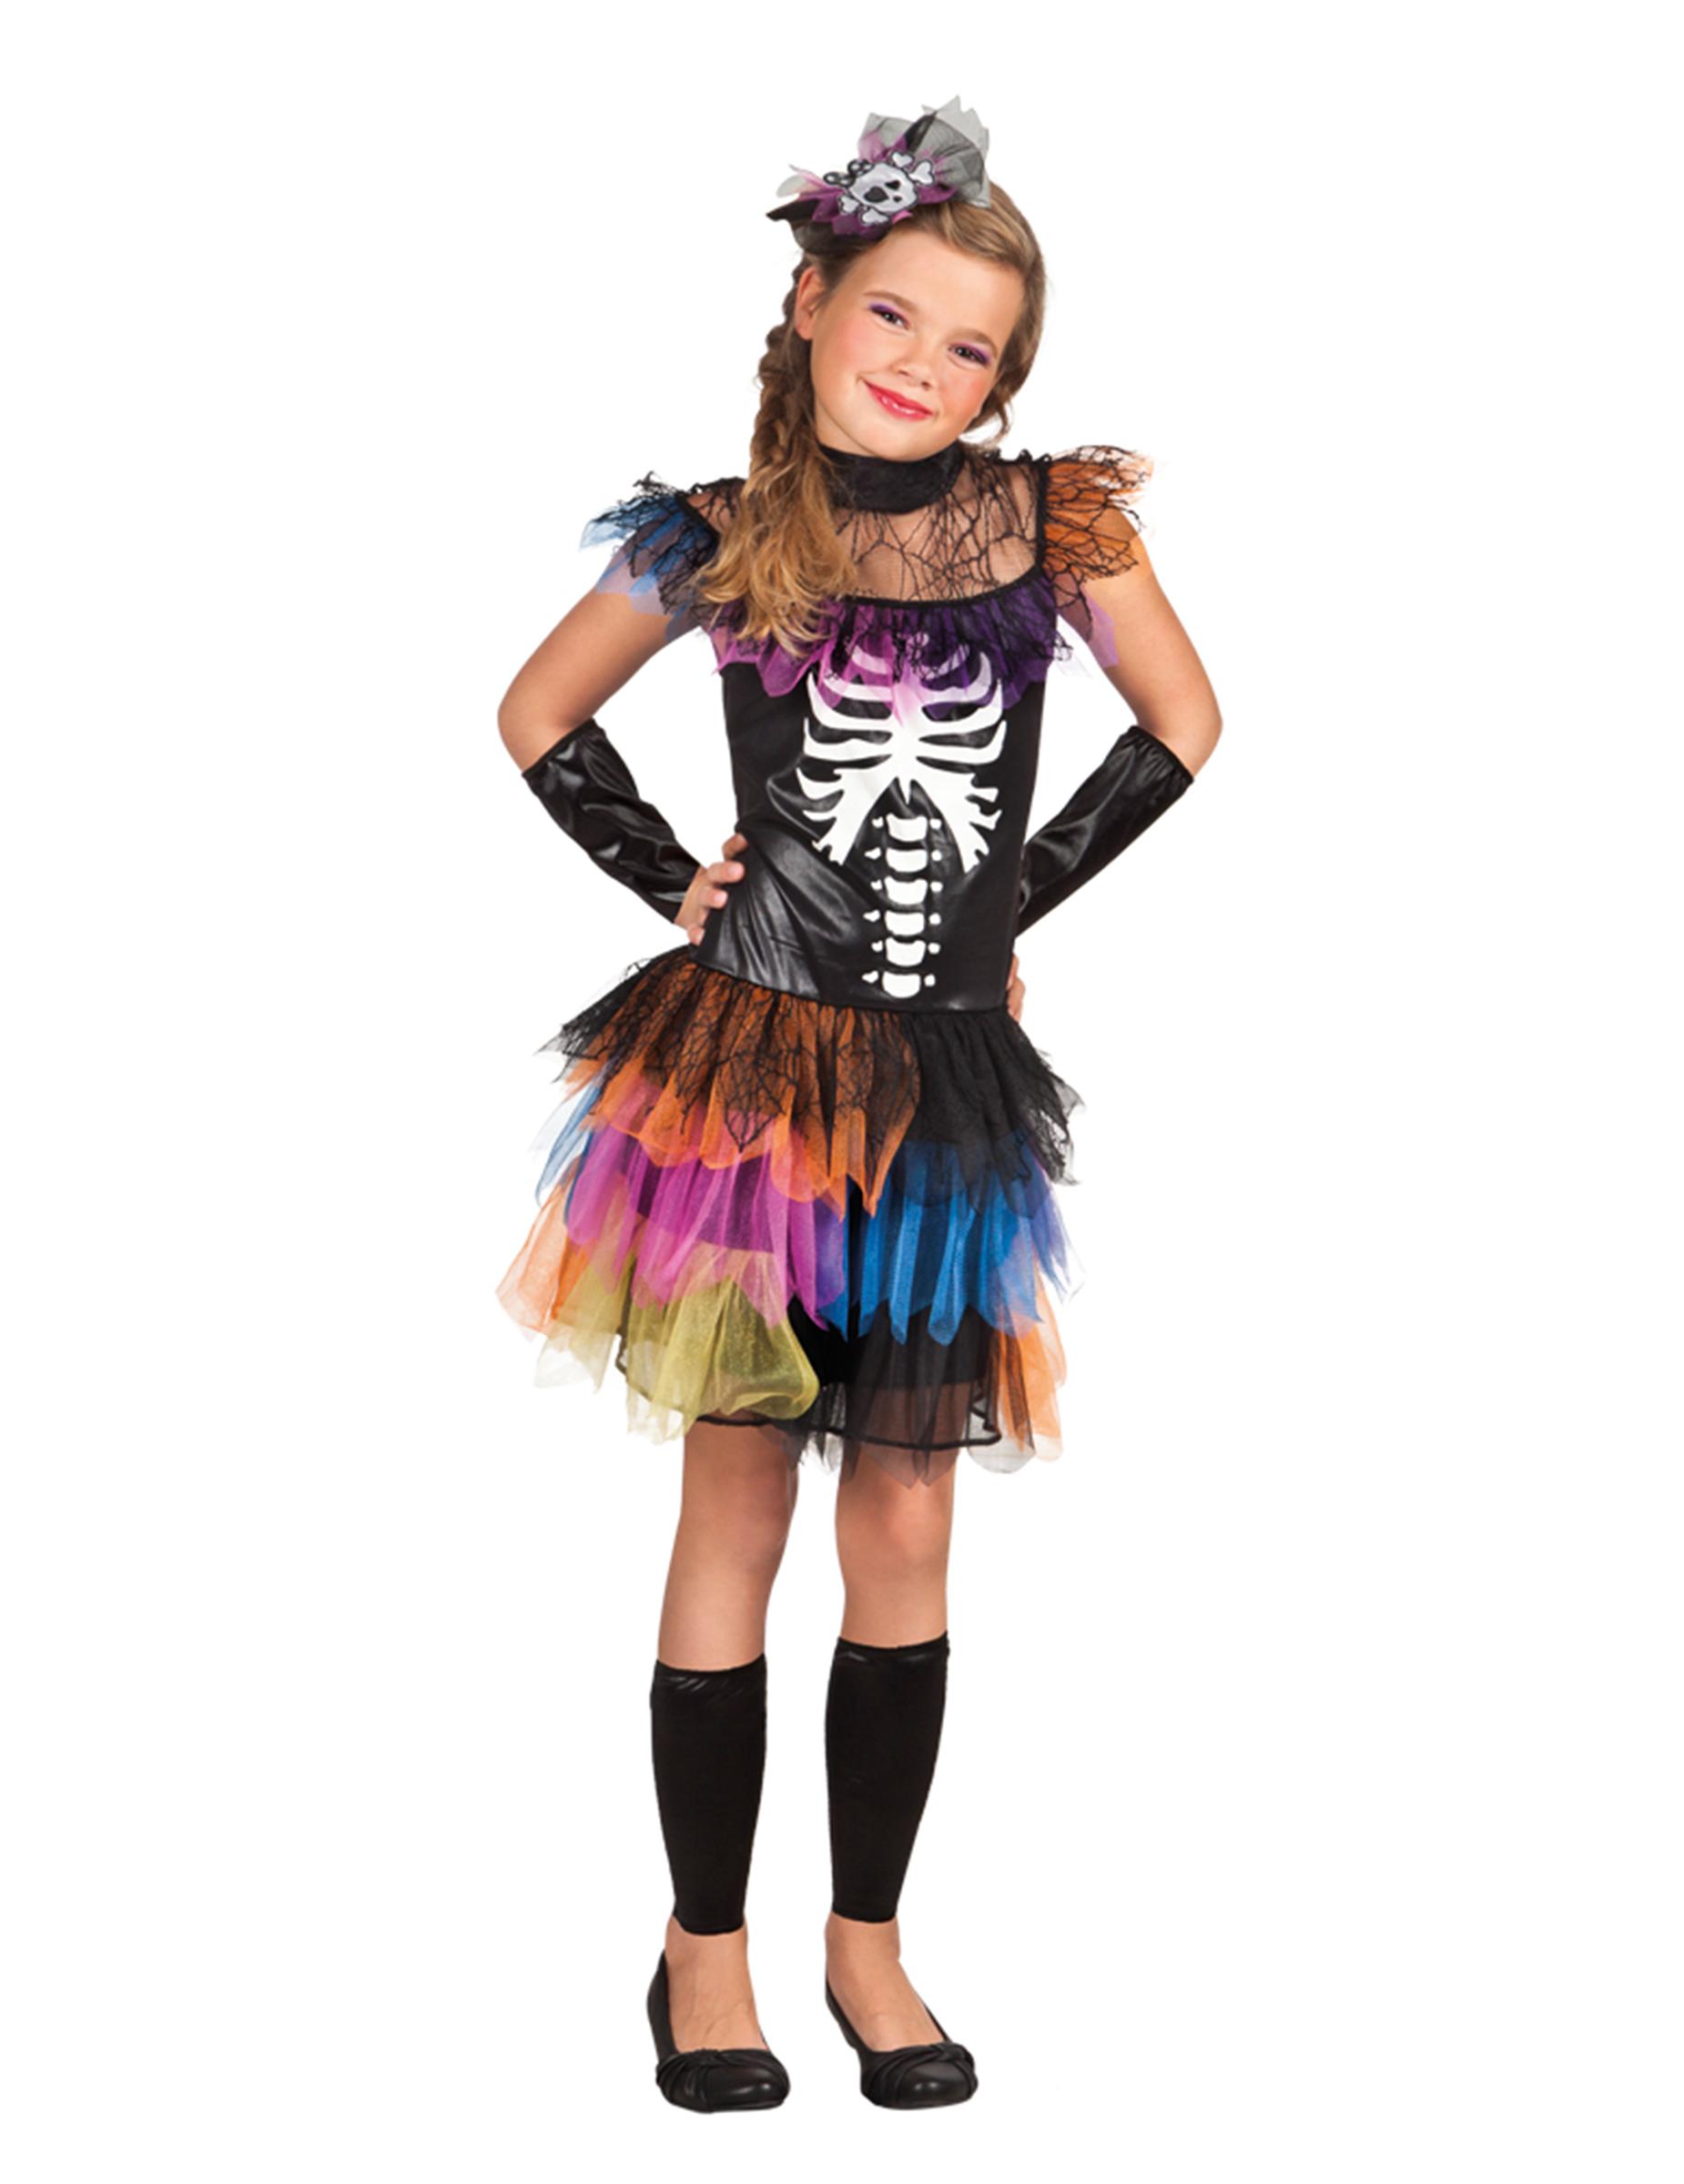 Bambina Vestito Scheletro Vestito Scheletro Vestito Scheletro Scheletro Bambina Bambina Scheletro Vestito Bambina Bambina Vestito 5RL4jA